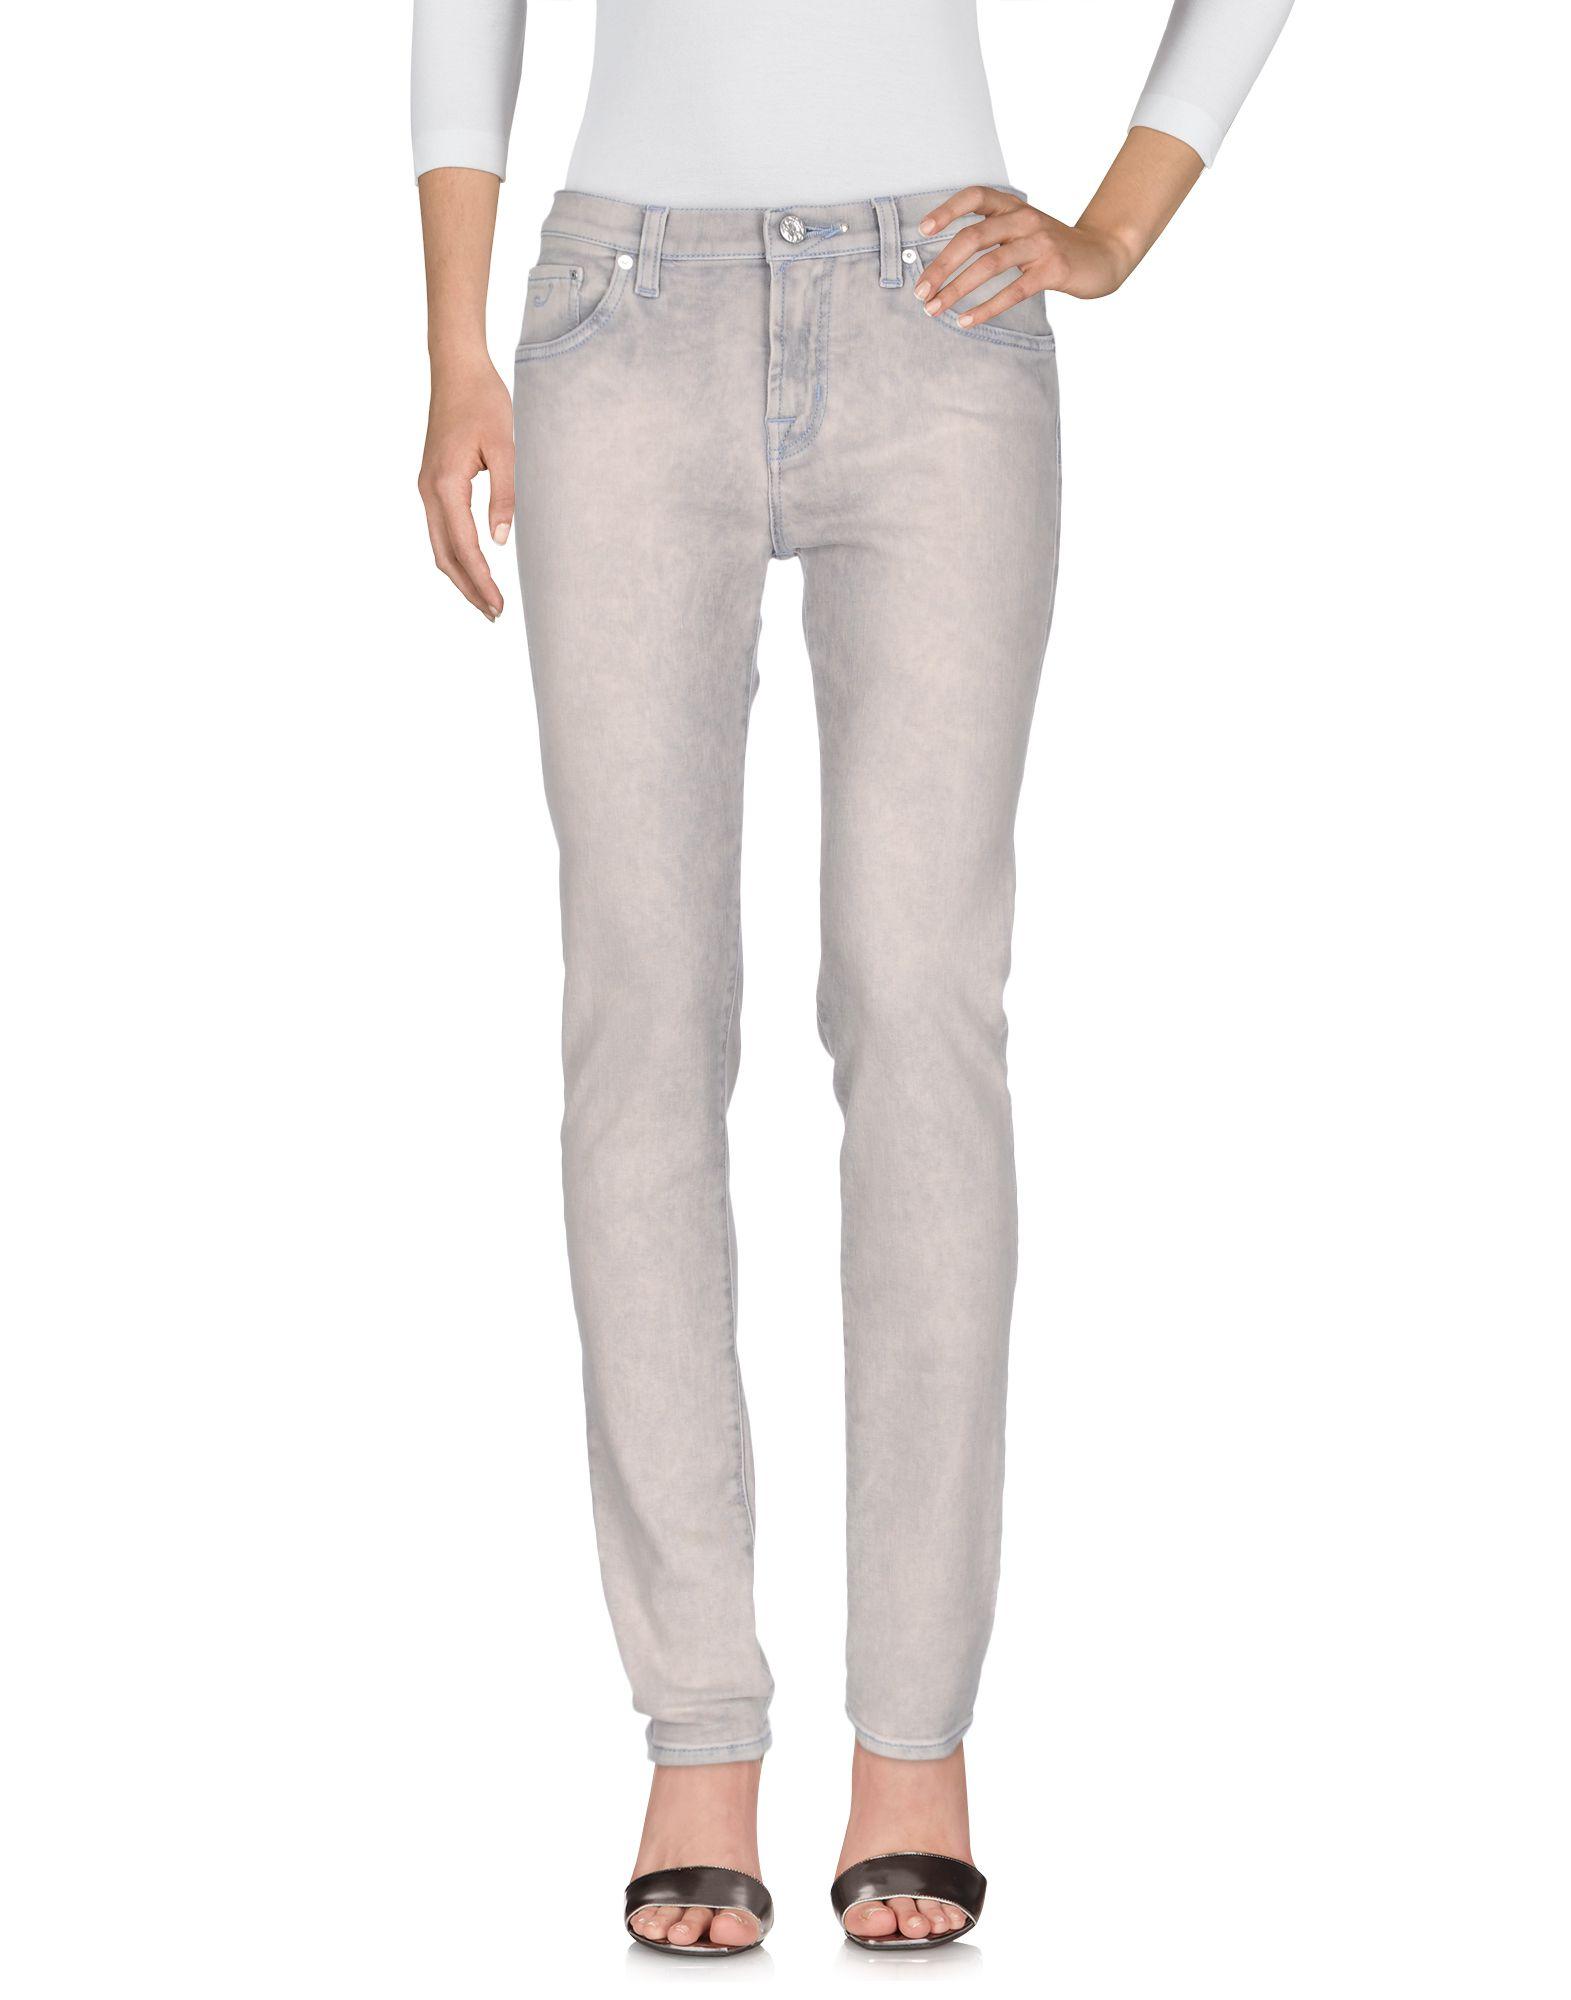 Pantaloni Jeans Jacob Cohёn Donna - Acquista online su yHK5PzXJi